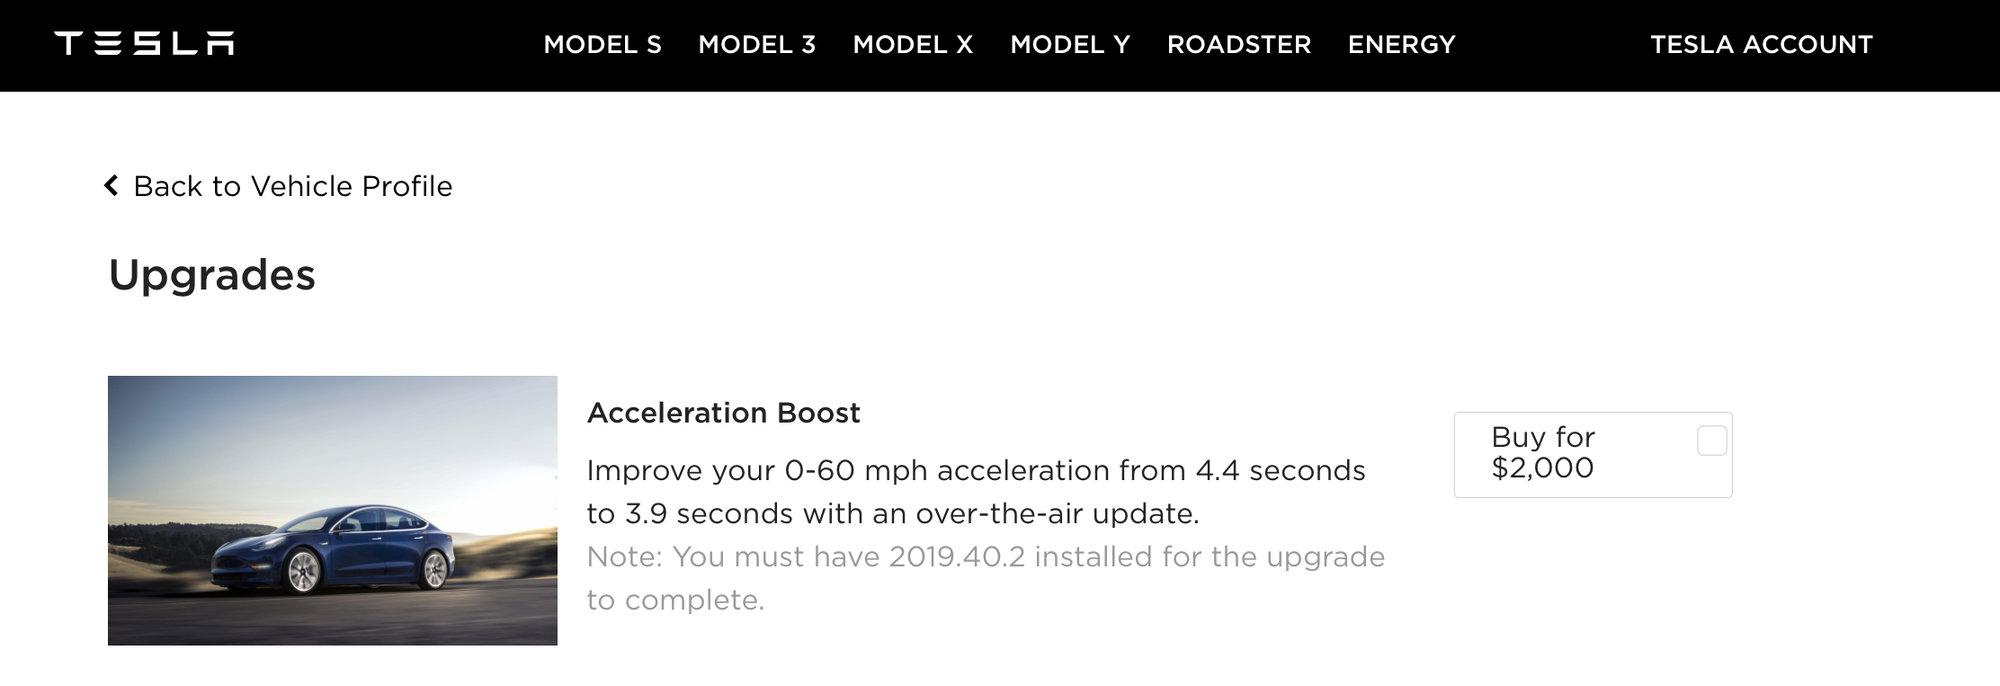 Tesla Model 3 AWD 'acceleration boost' option for $2,000.